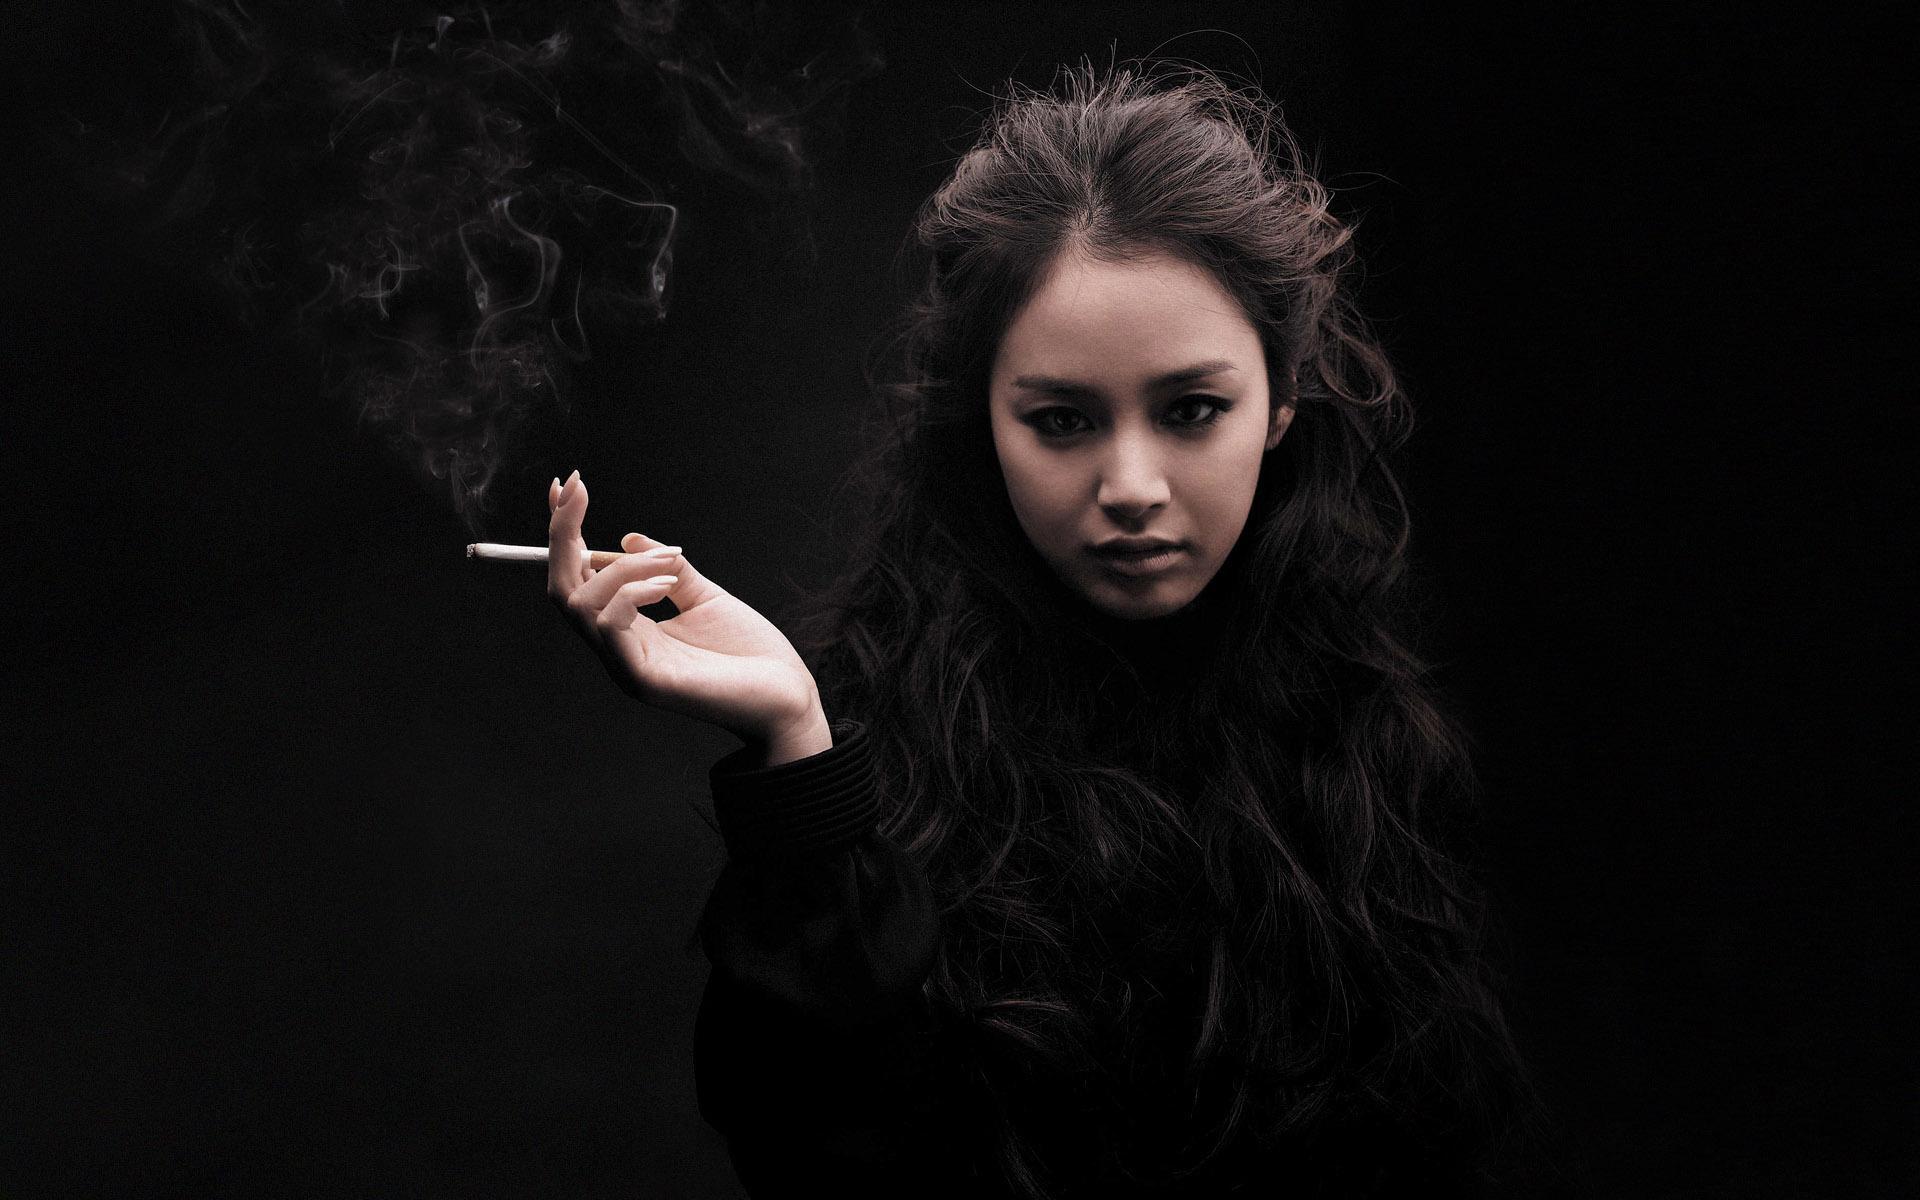 азиатка с сигаретой